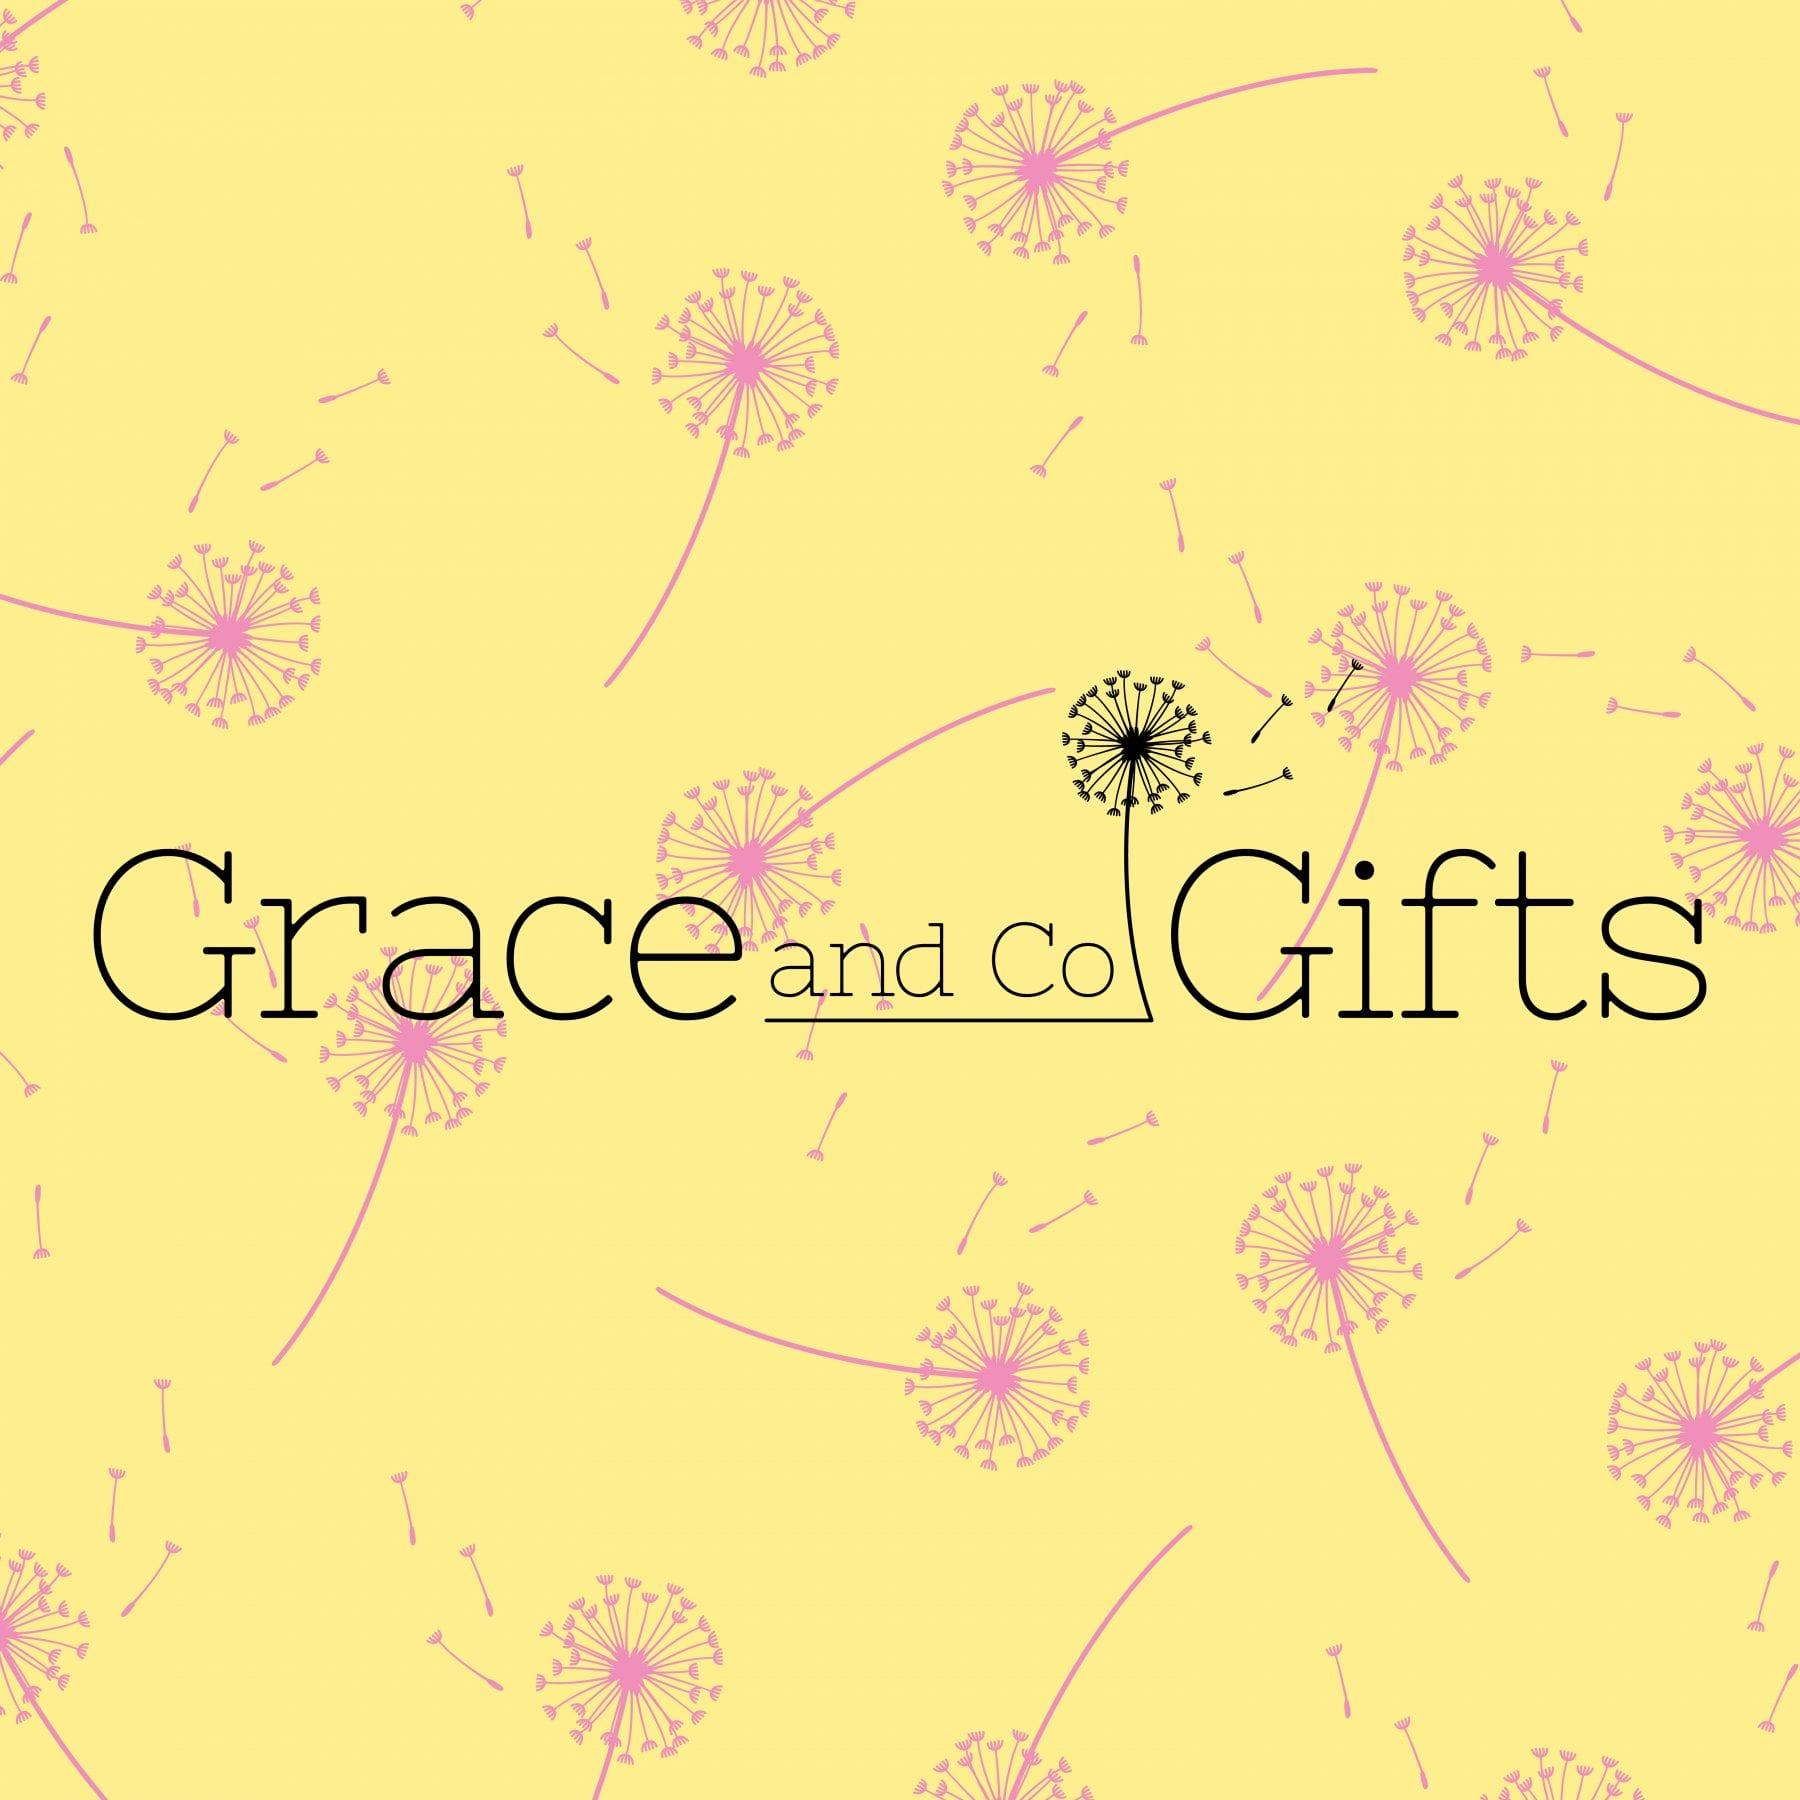 Grace and go gifts logo design by graphic designer and brand designer Jessica Croome of Perth WA